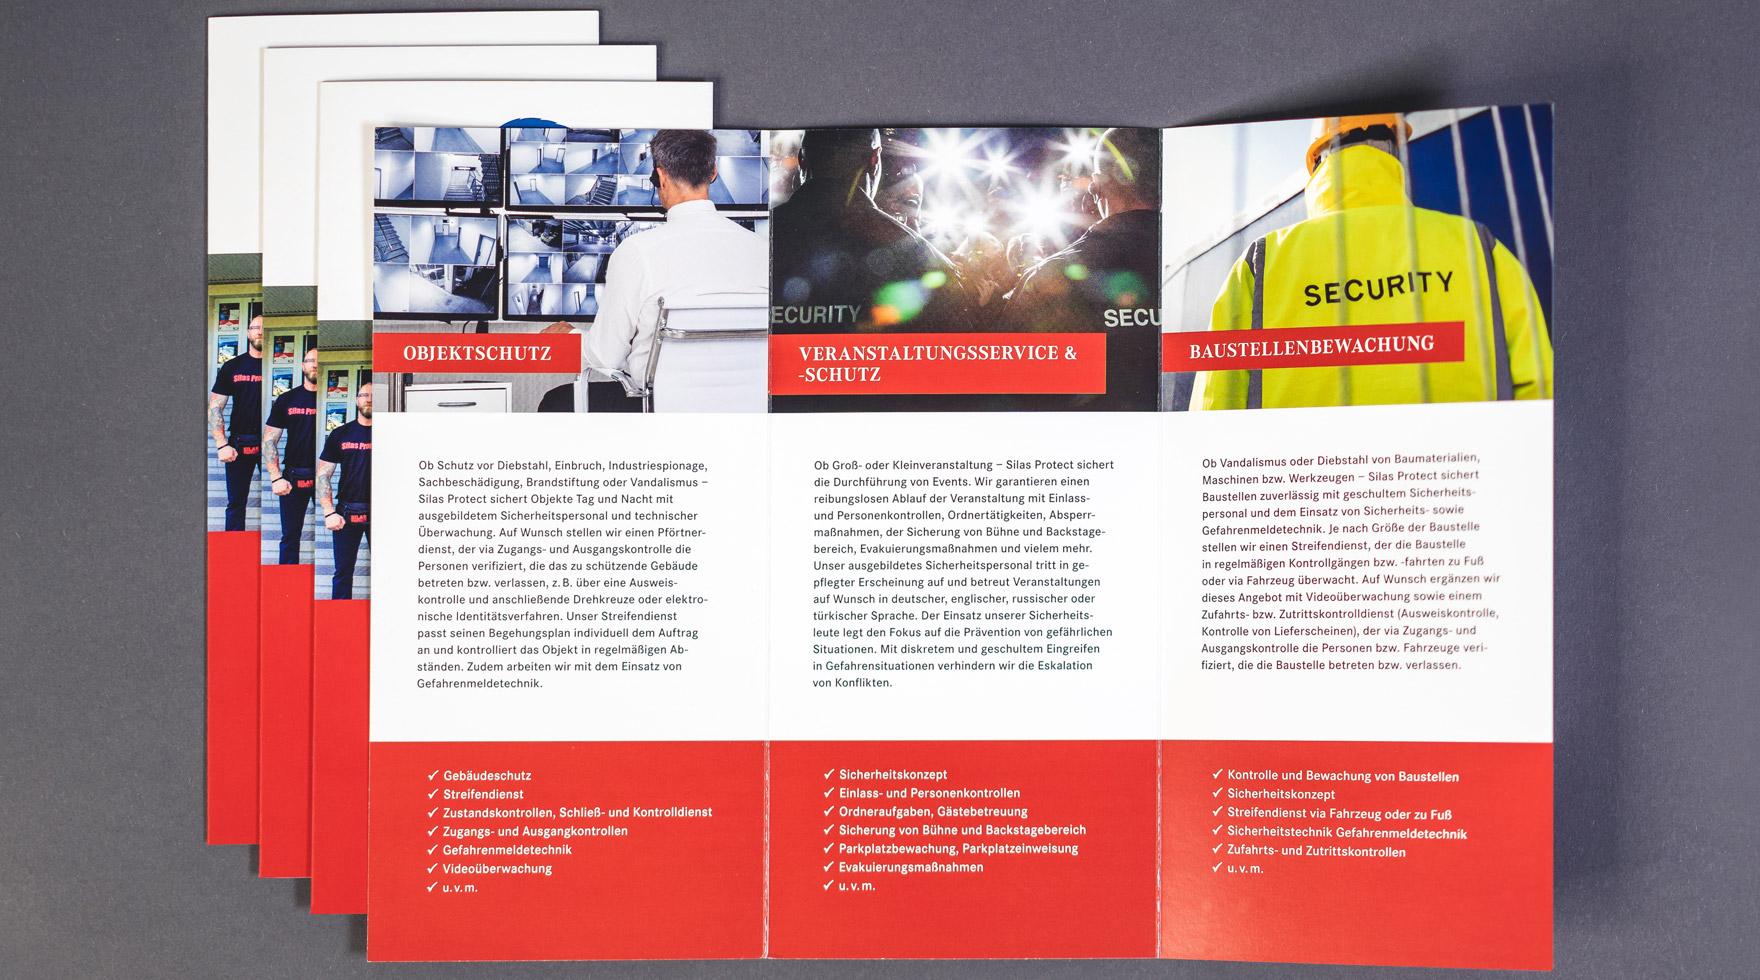 Faltblatt-silas-protect-berlin-sicherheit